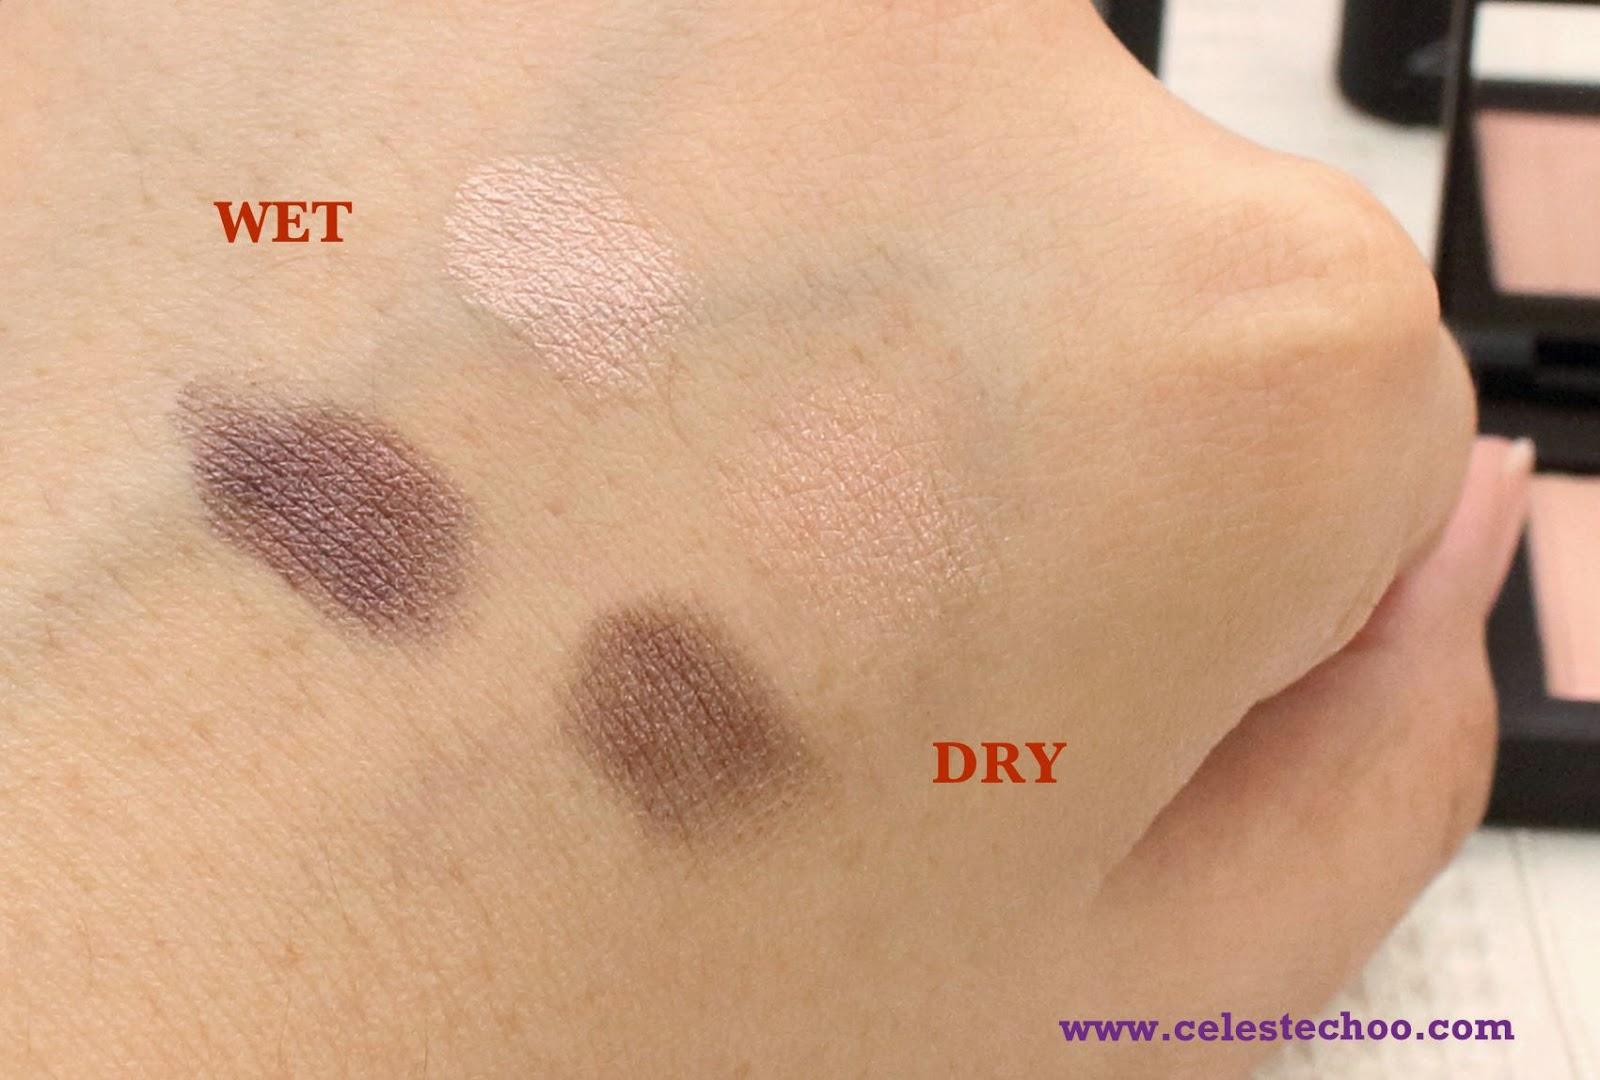 nars_cosmetics_beauty_makeup_eyeshadows_brush_wet_dry